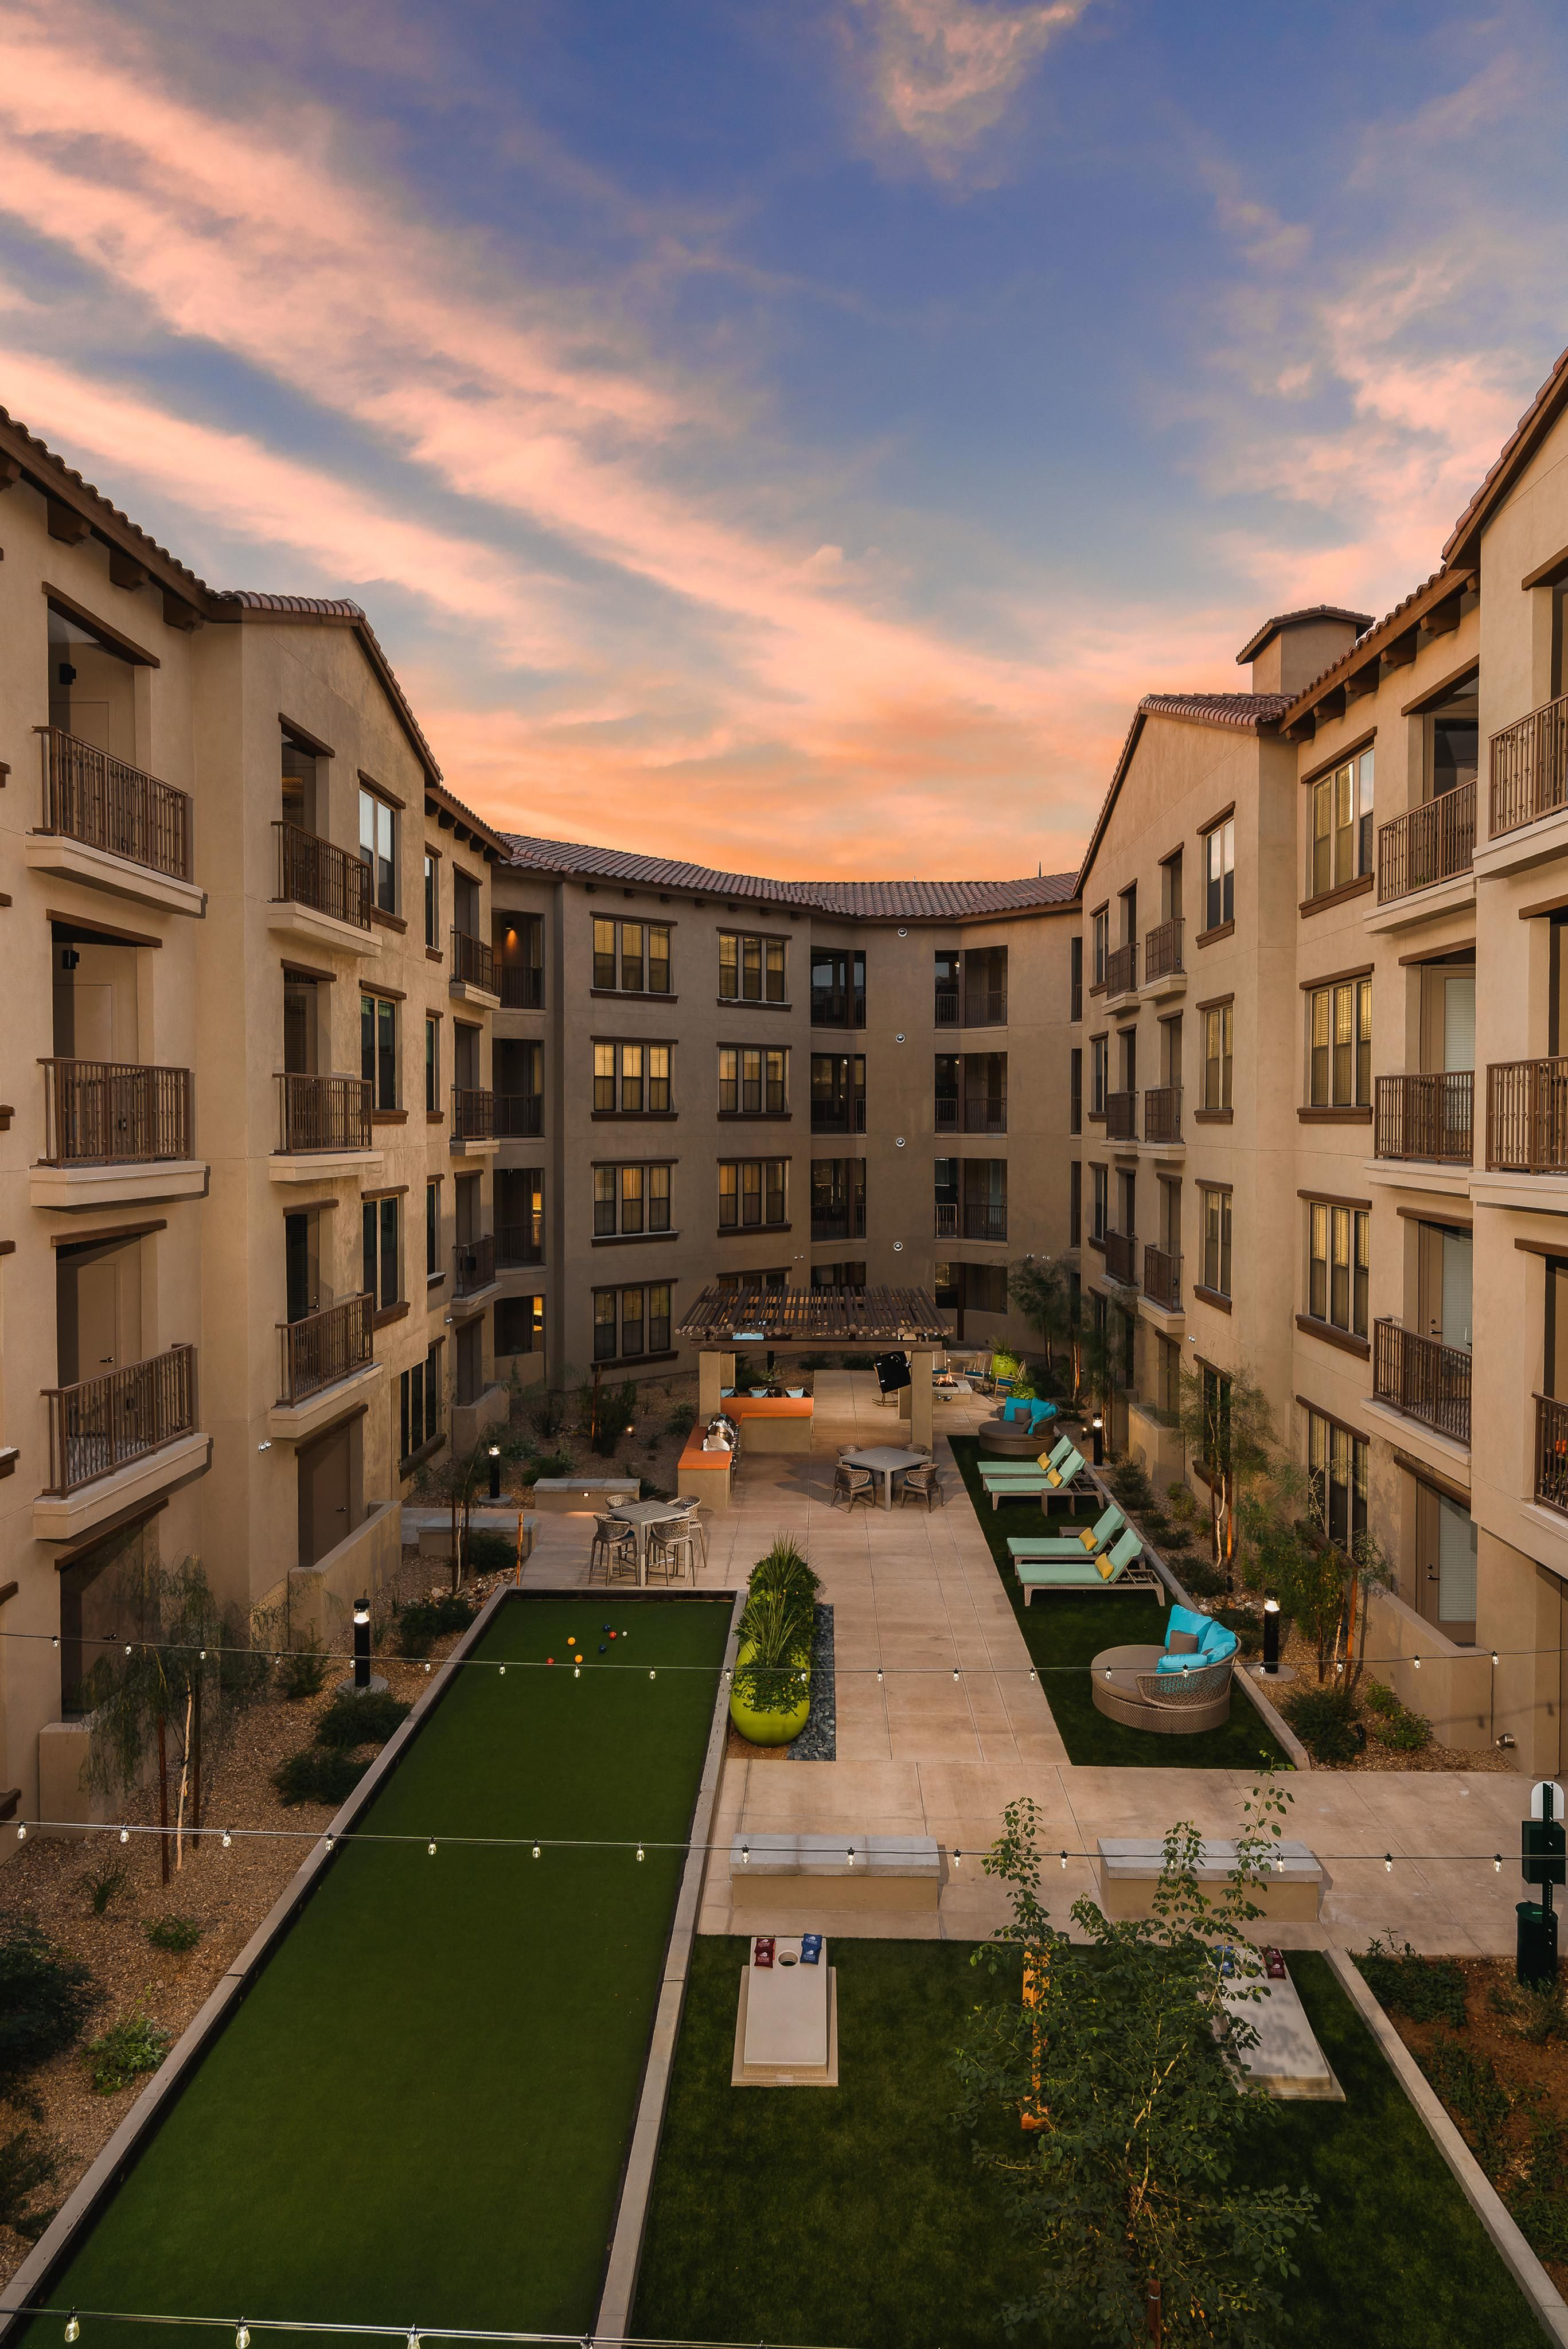 Scottsdale Az Apartment Rentals The Core Scottsdale One Bedroom Apartment Bedroom Apartment One Bedroom